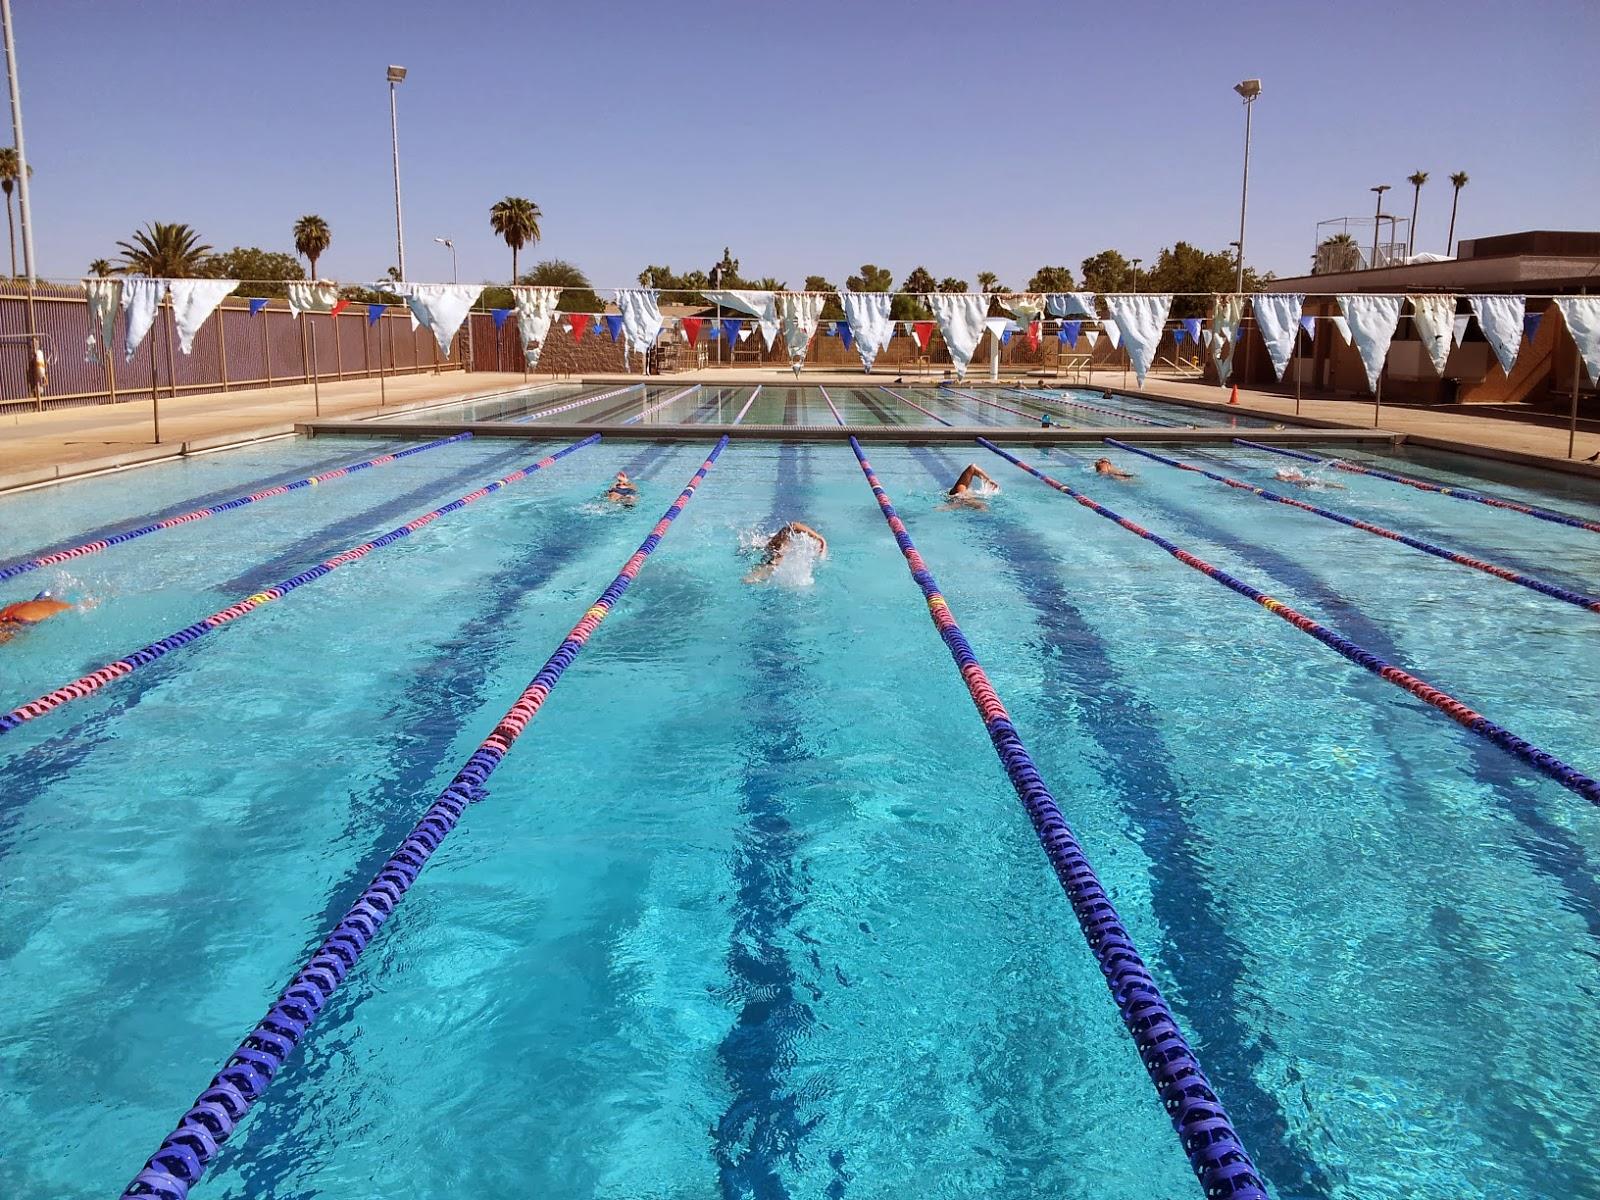 Deblog deblog november 2013 for Tempe swimming pool